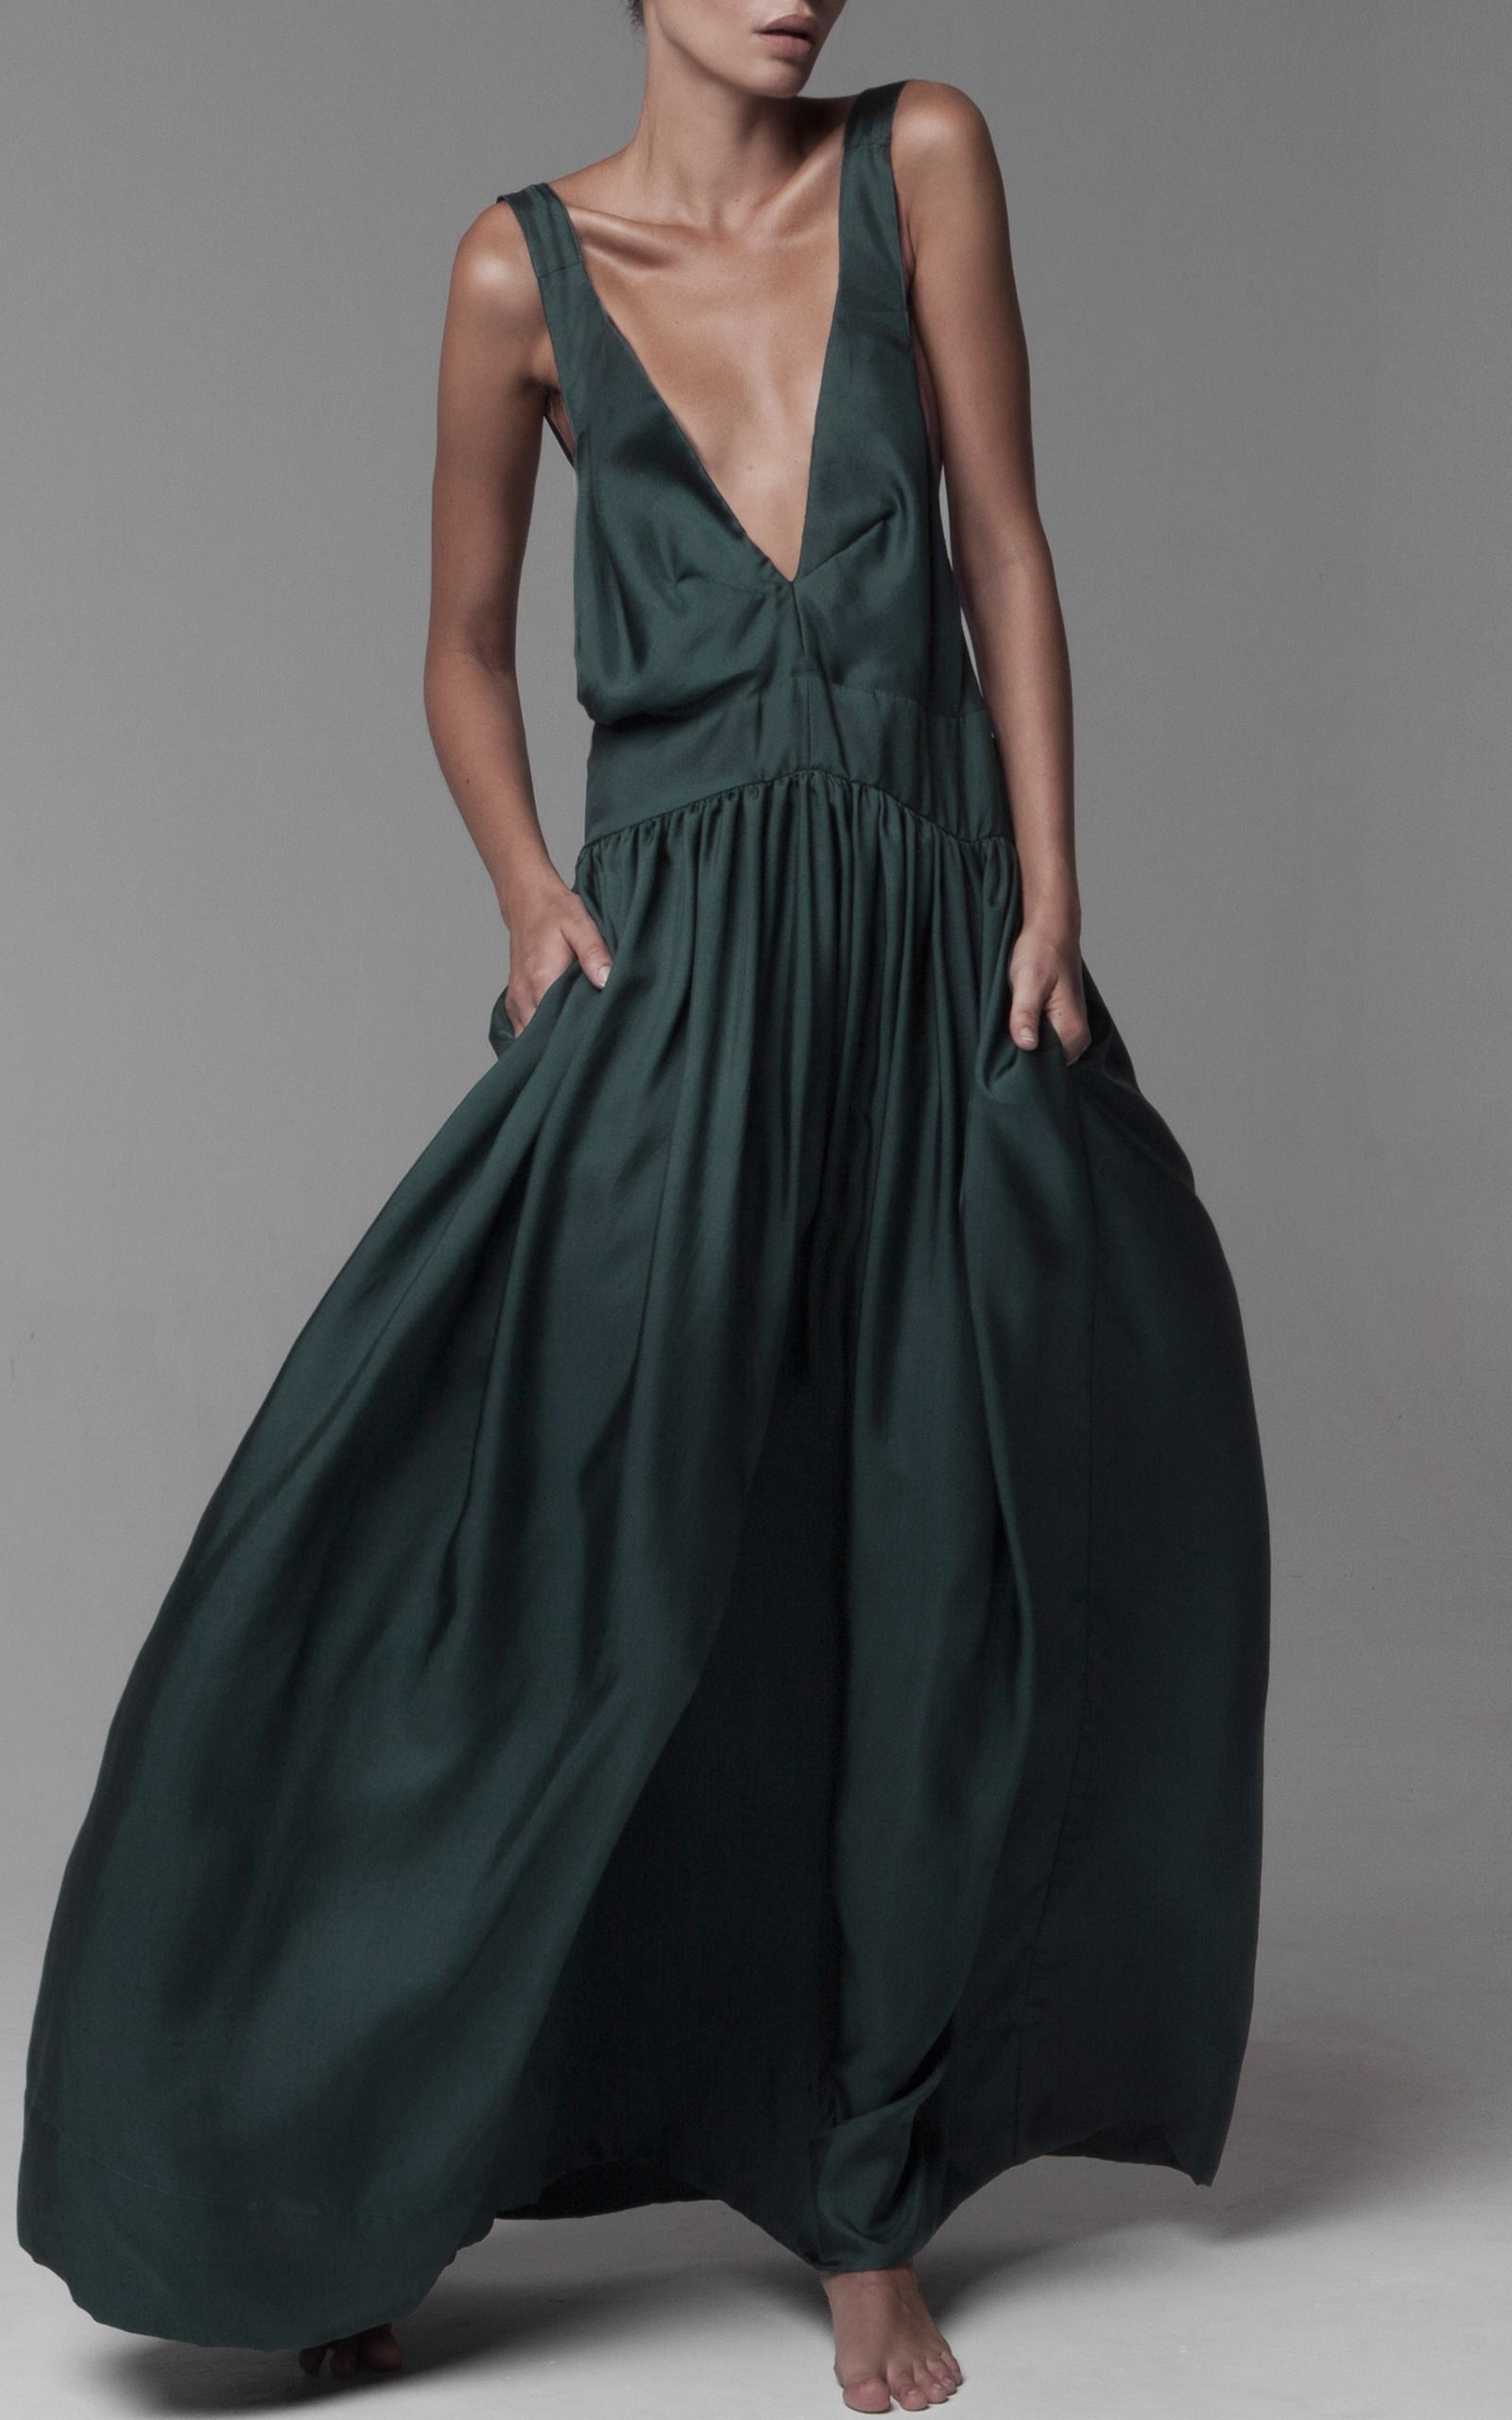 Zephyr Pinafore Dress by KALITA for Preorder on Moda Operandi  8383891b16a